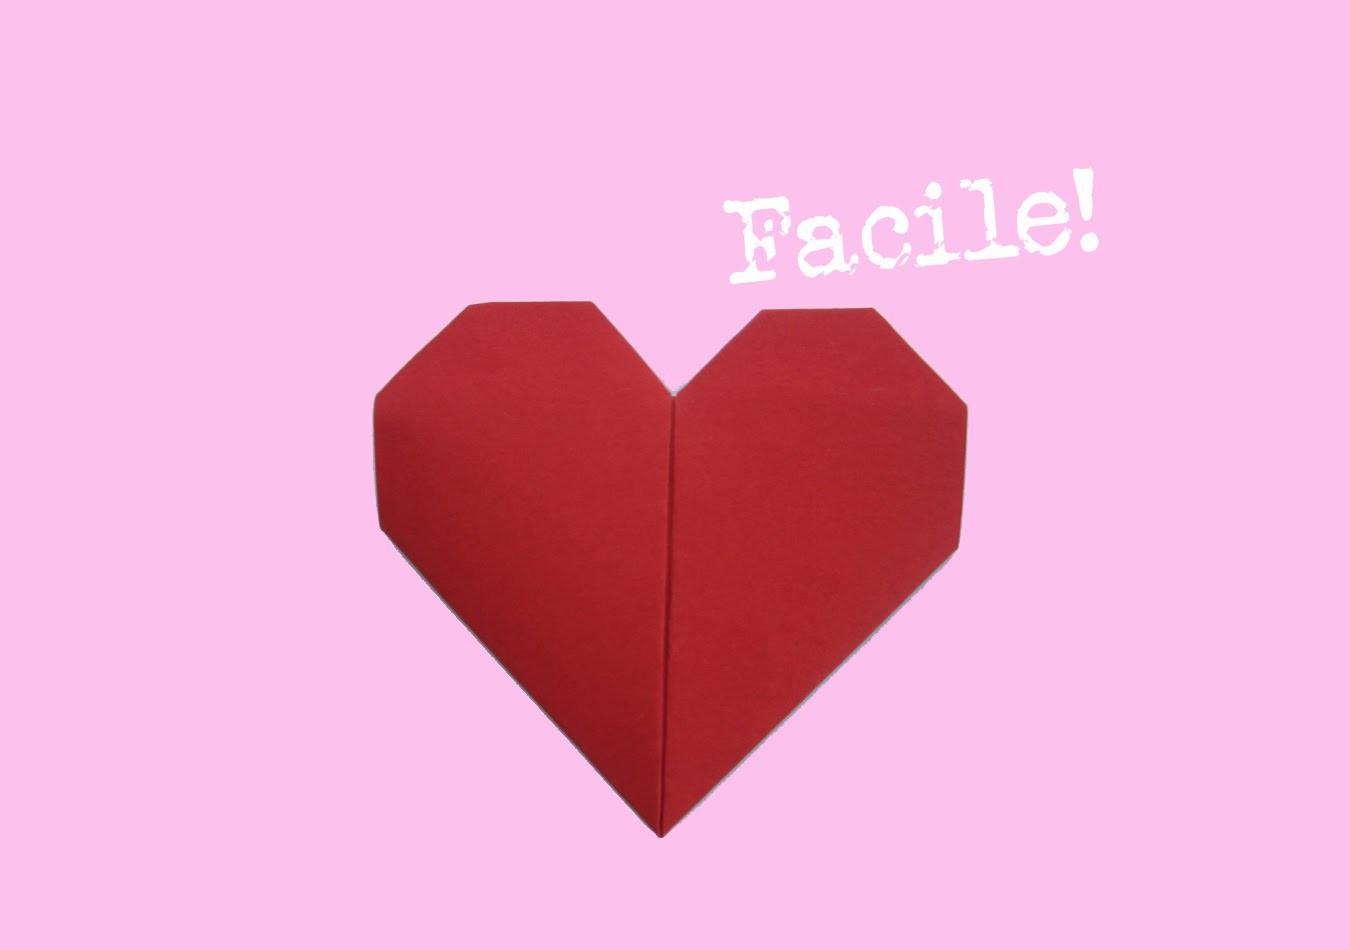 Faire un coeur en origami - papier - facile - bricoler - instruction - tutorial